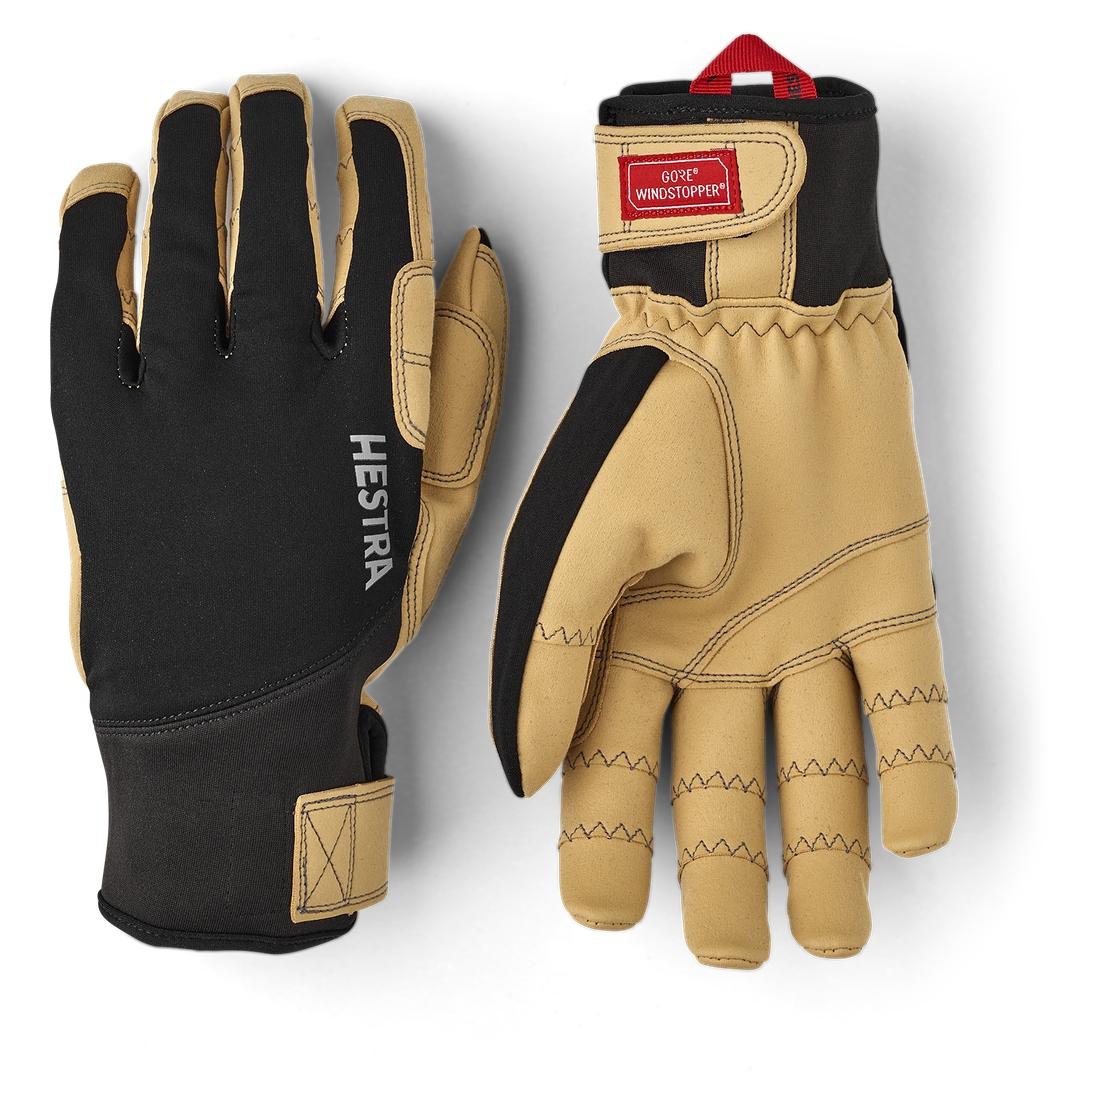 Picture of Hestra Ergo Grip Tactility - 5 Finger Outdoor Gloves - black